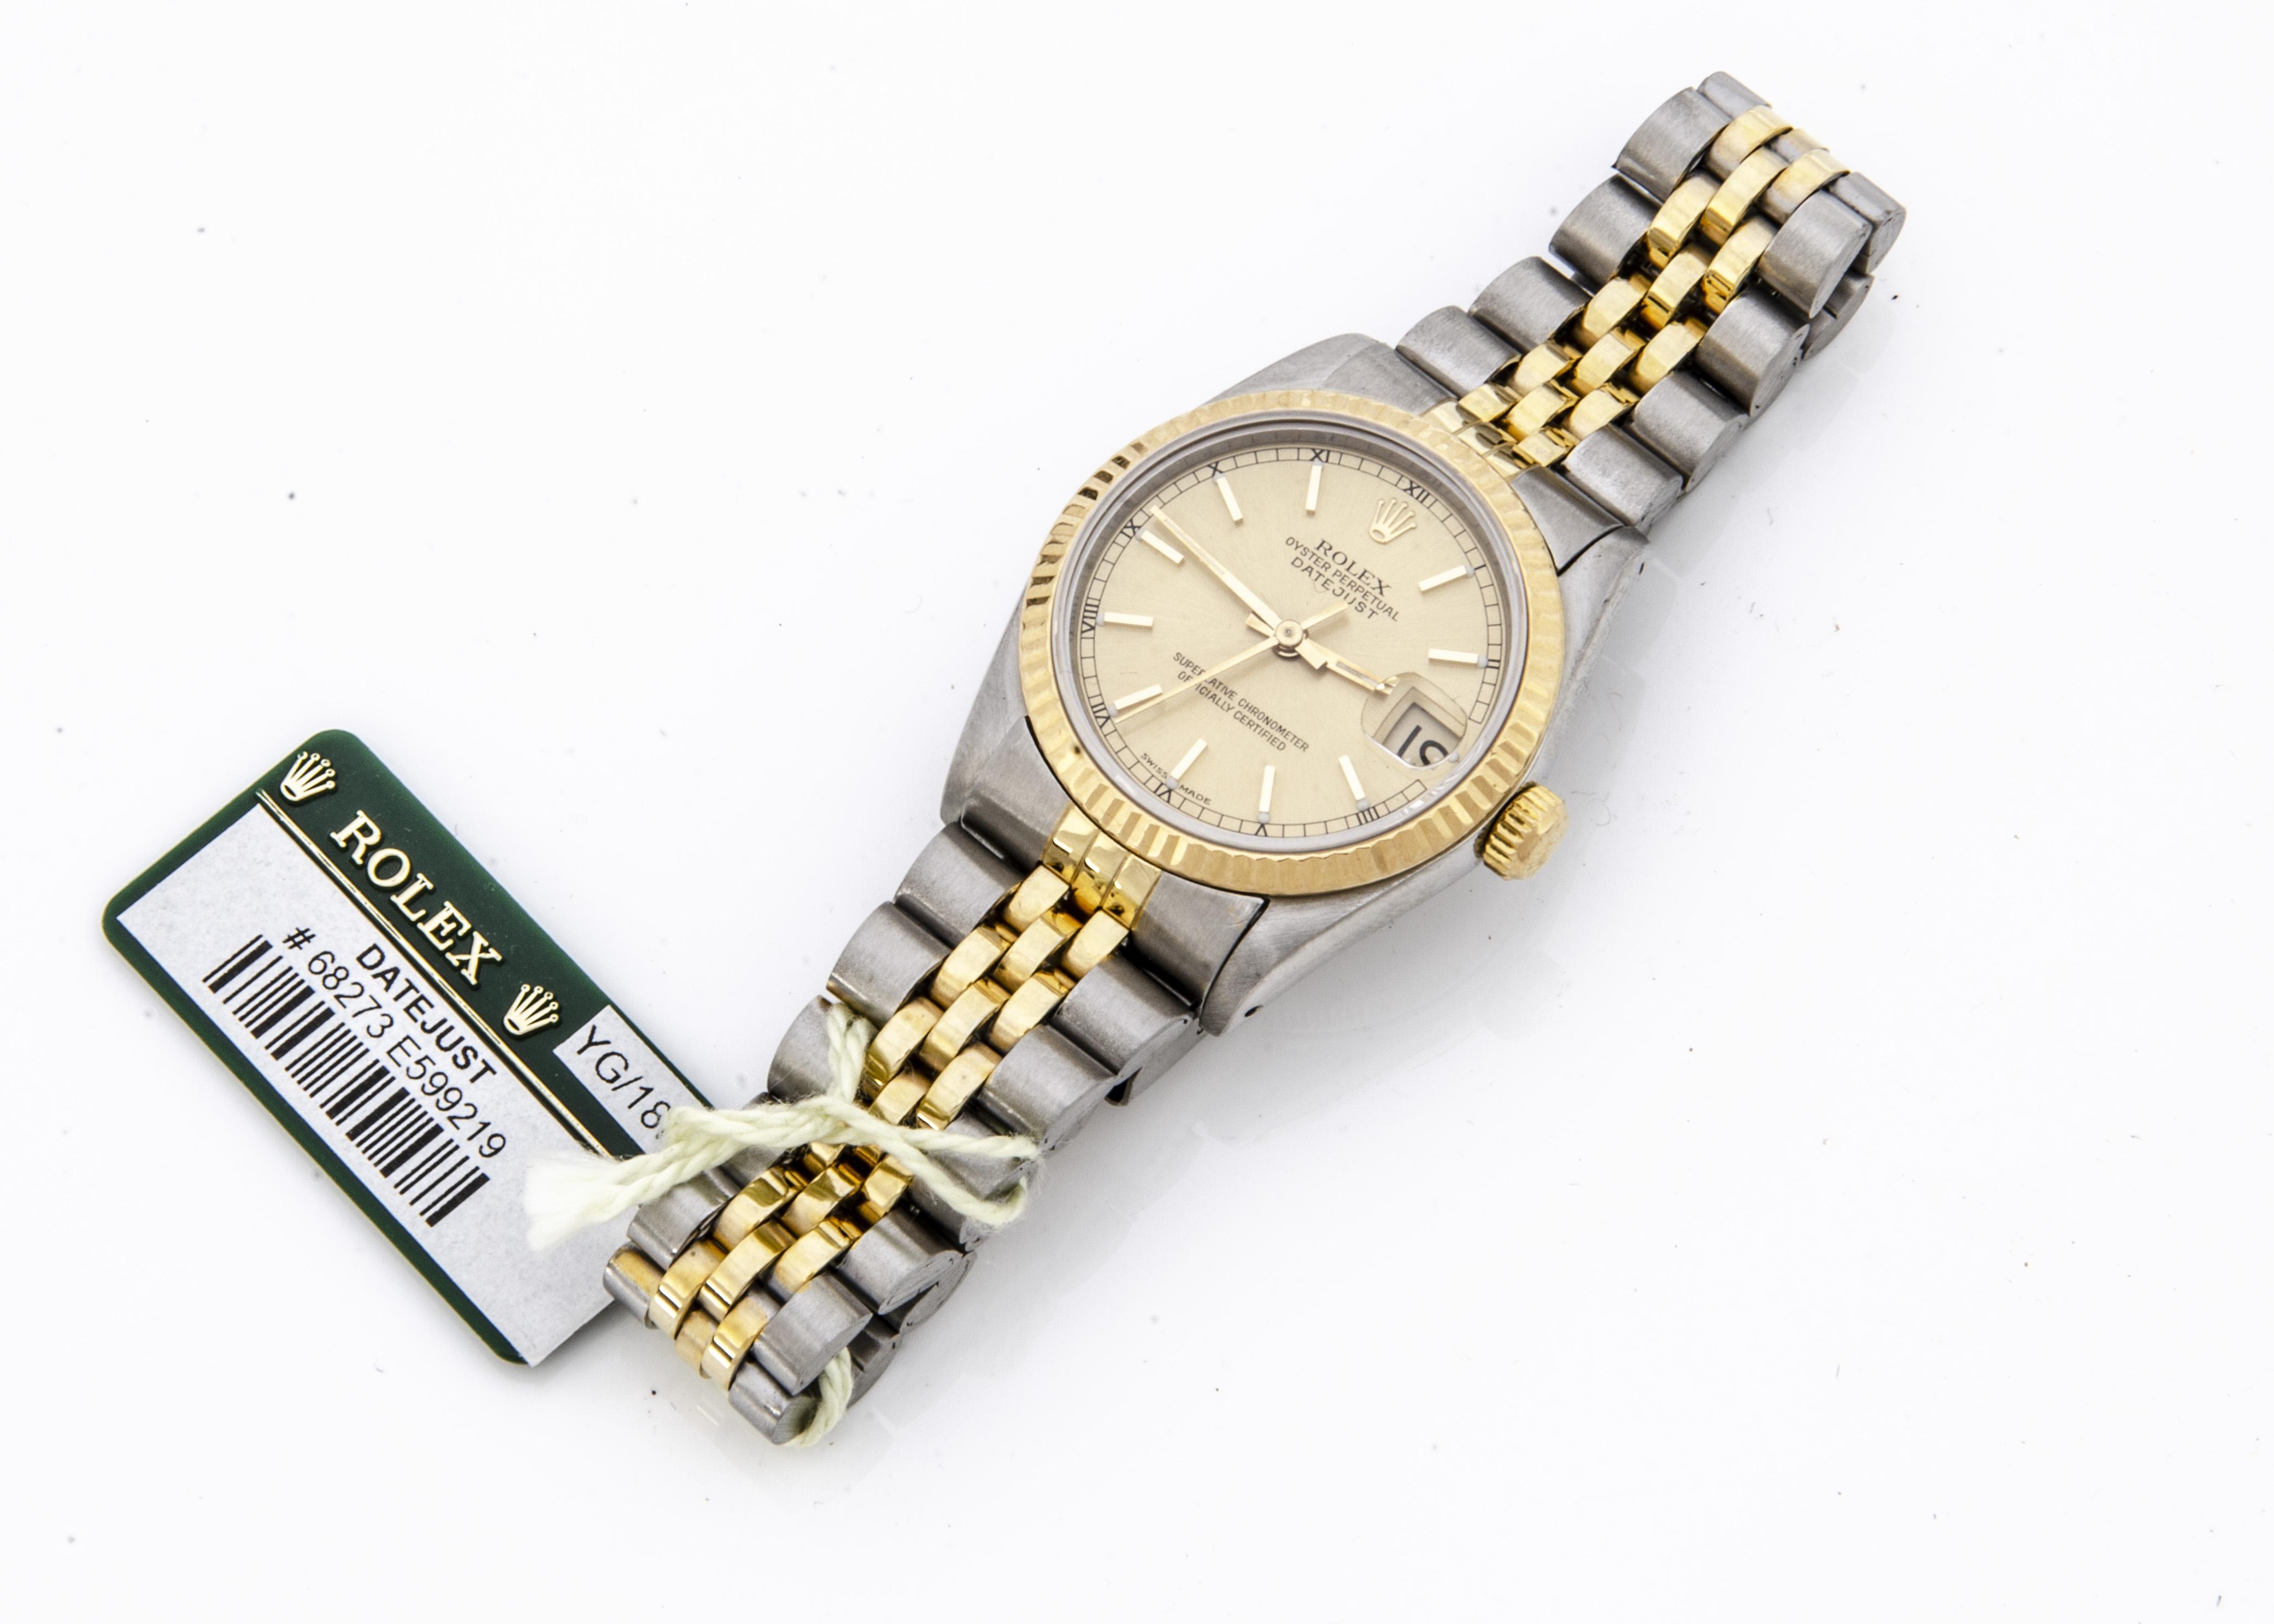 A 1990s Rolex Oyster Perpetual Datejust Bi-metal lady's mid-sized wristwatch, 29mm, ref. 68273, gilt